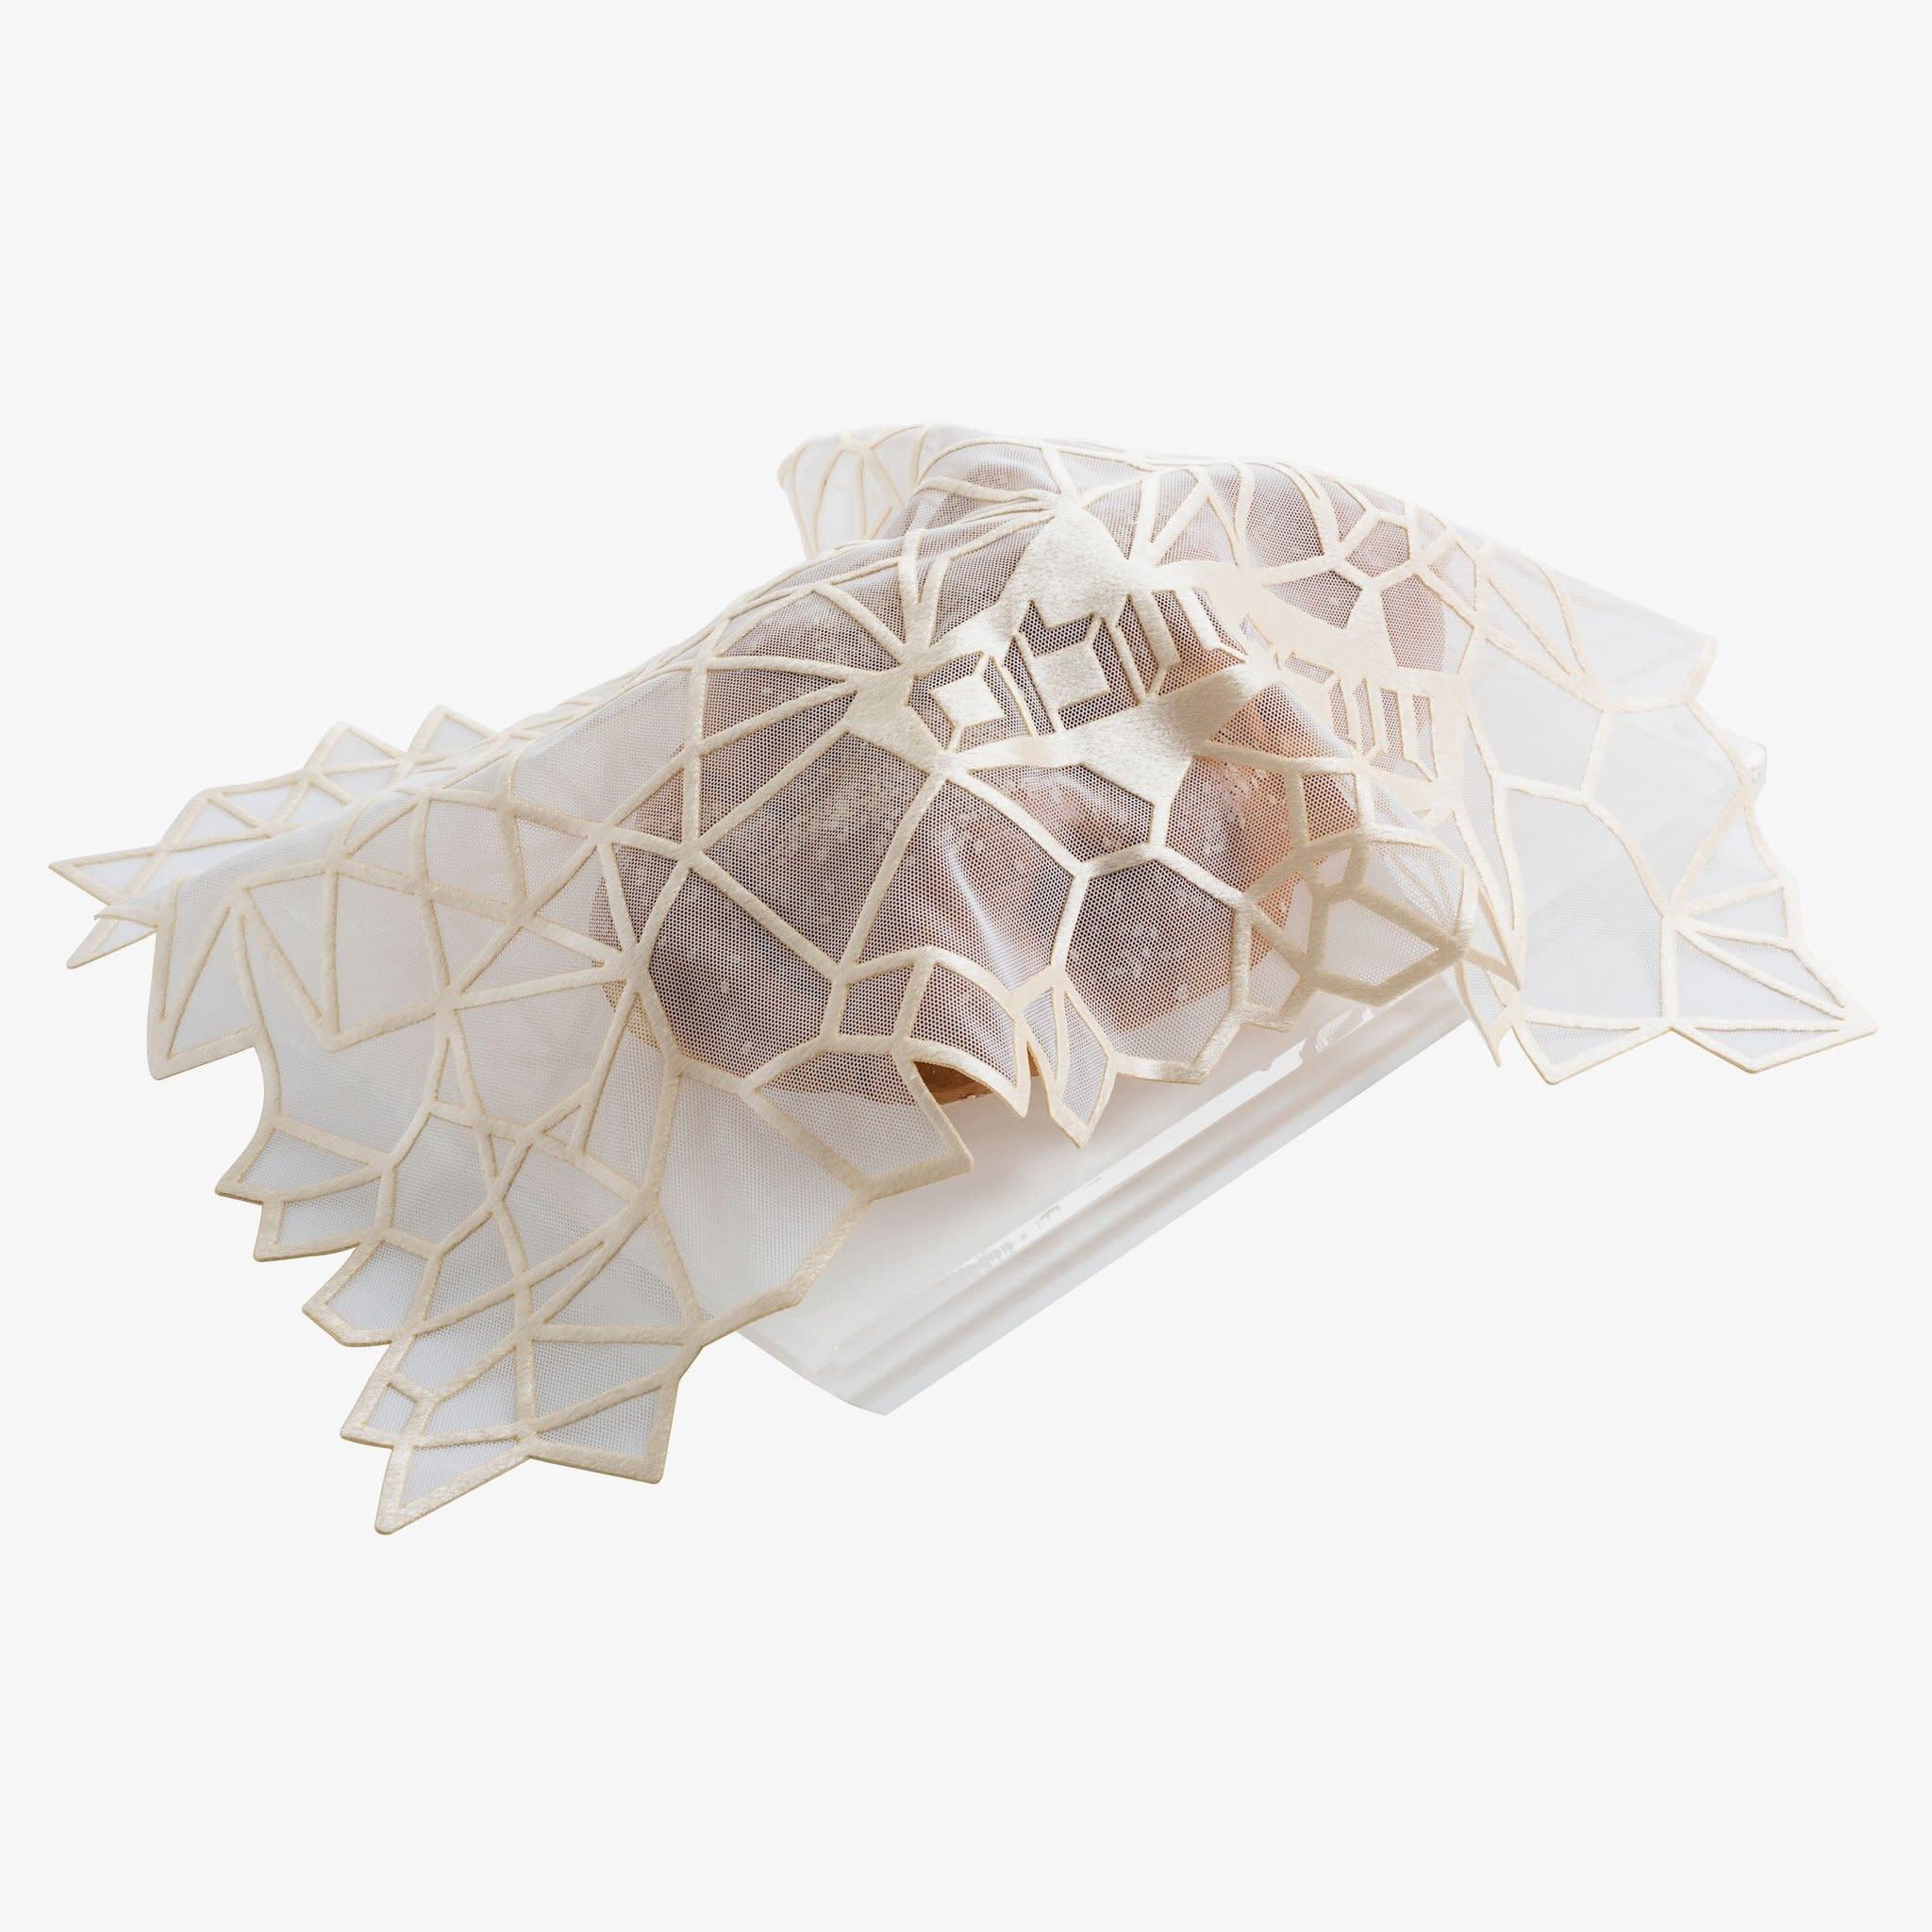 Apeloig Collection Challah Cover Geometric Cream